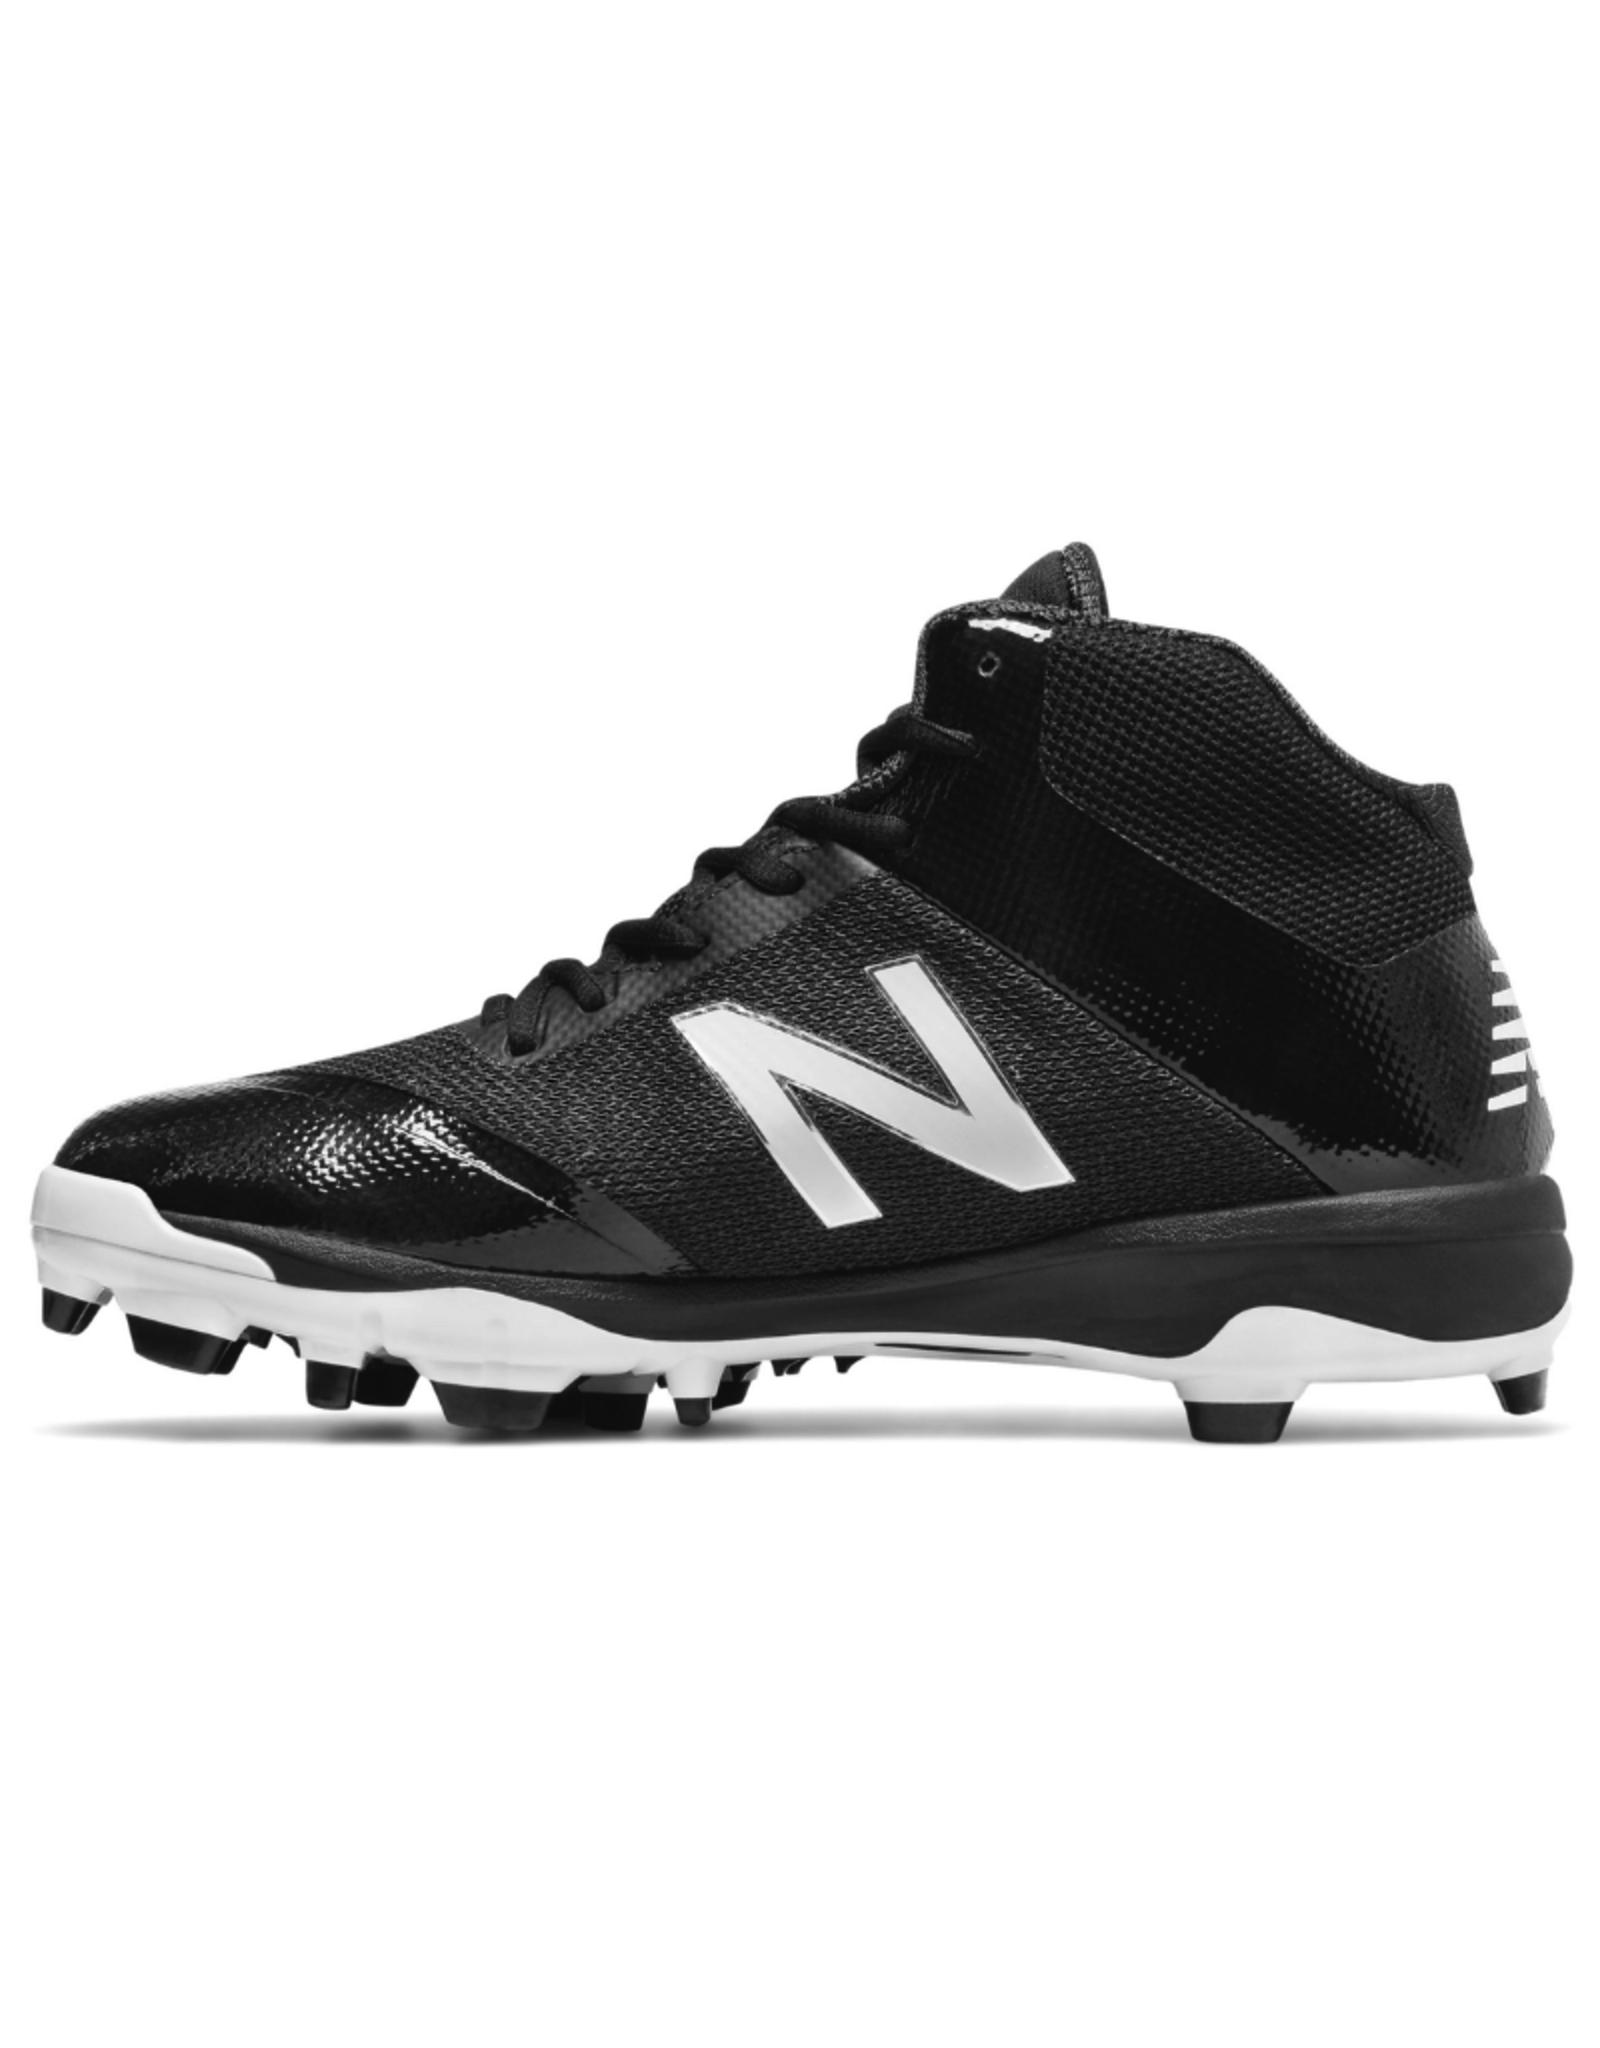 New Balance Men's Mid Softball Cleats Black